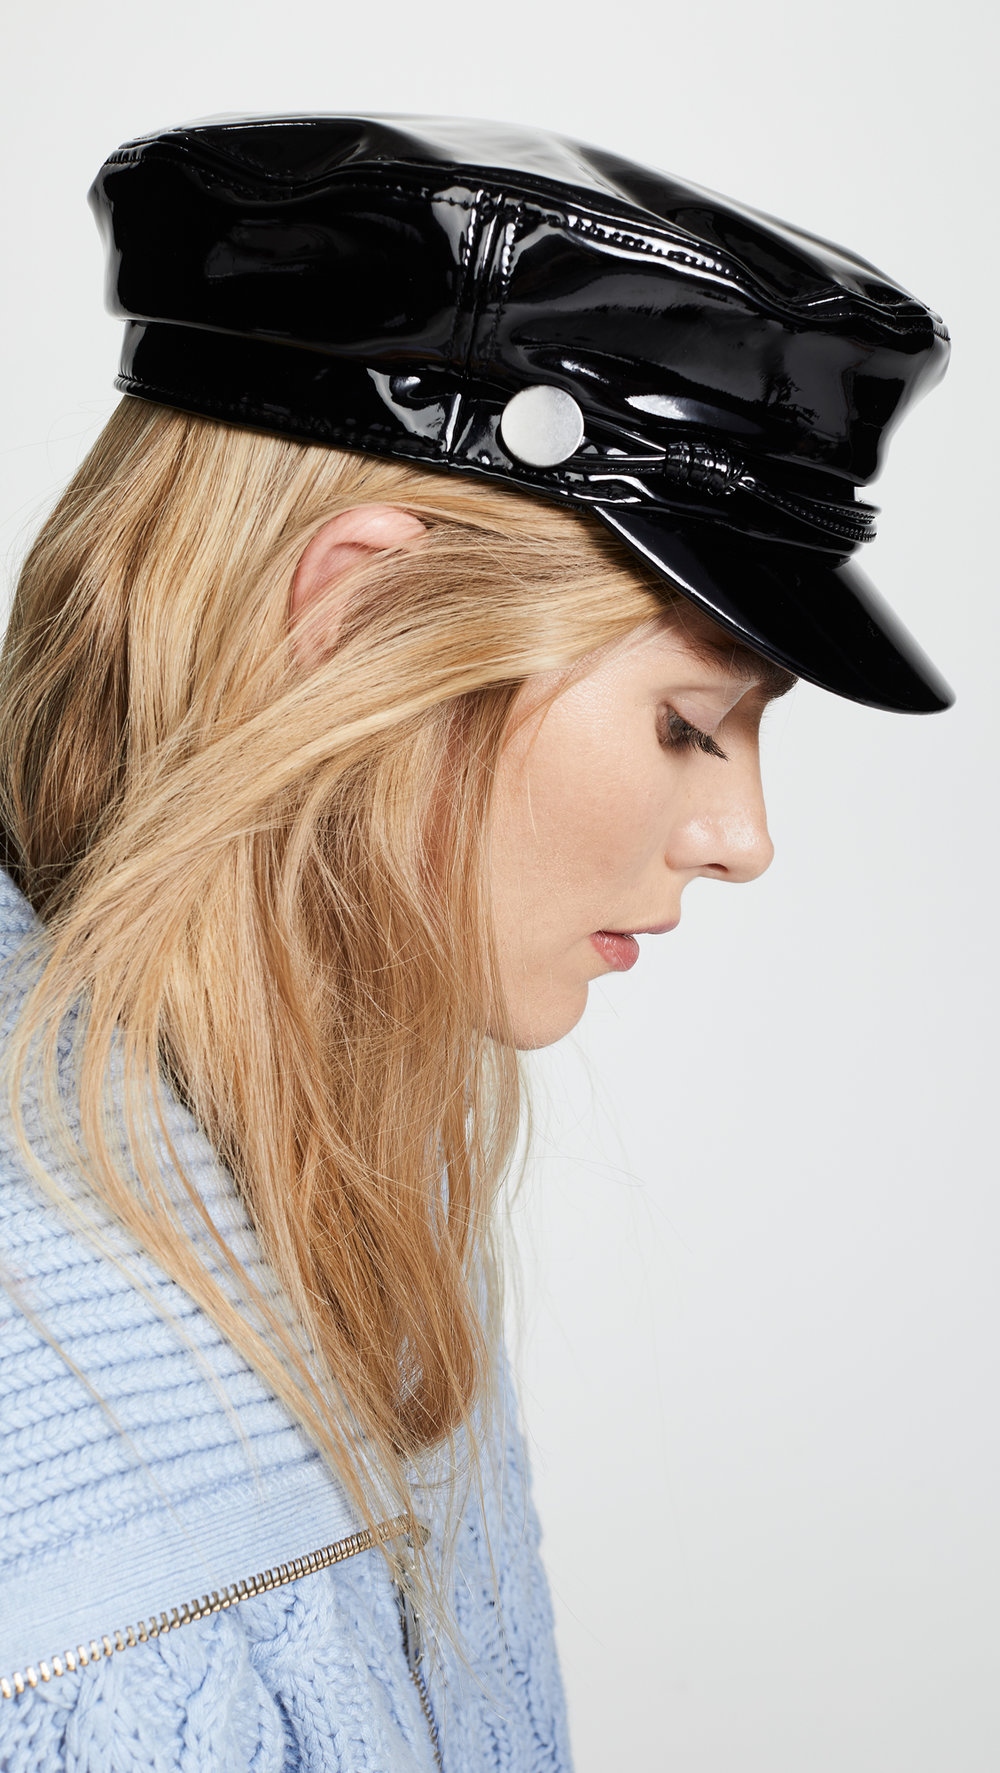 Eugenia Kim hat - Was: $68.00Now: $34.00